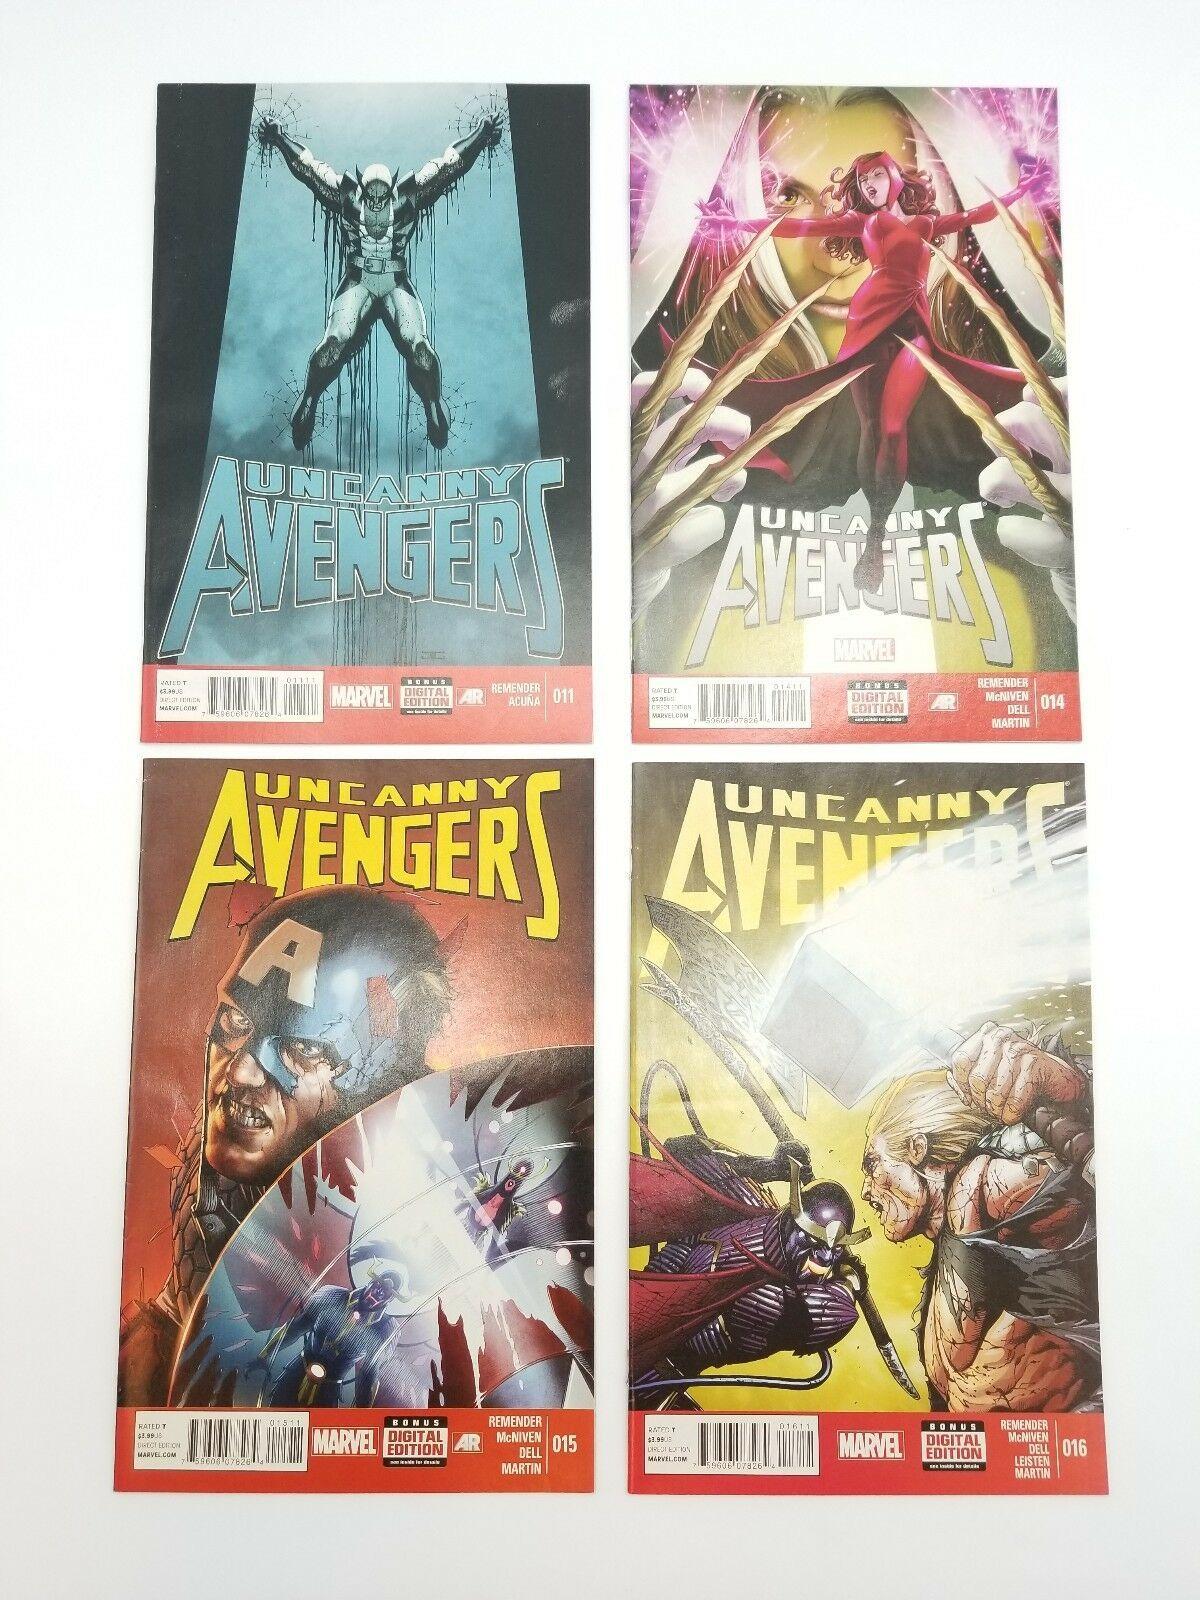 Uncanny Avengers 1-11 14-16 w/ Skottie Young Baby Variant Vol 1 2012 Comic Books image 8